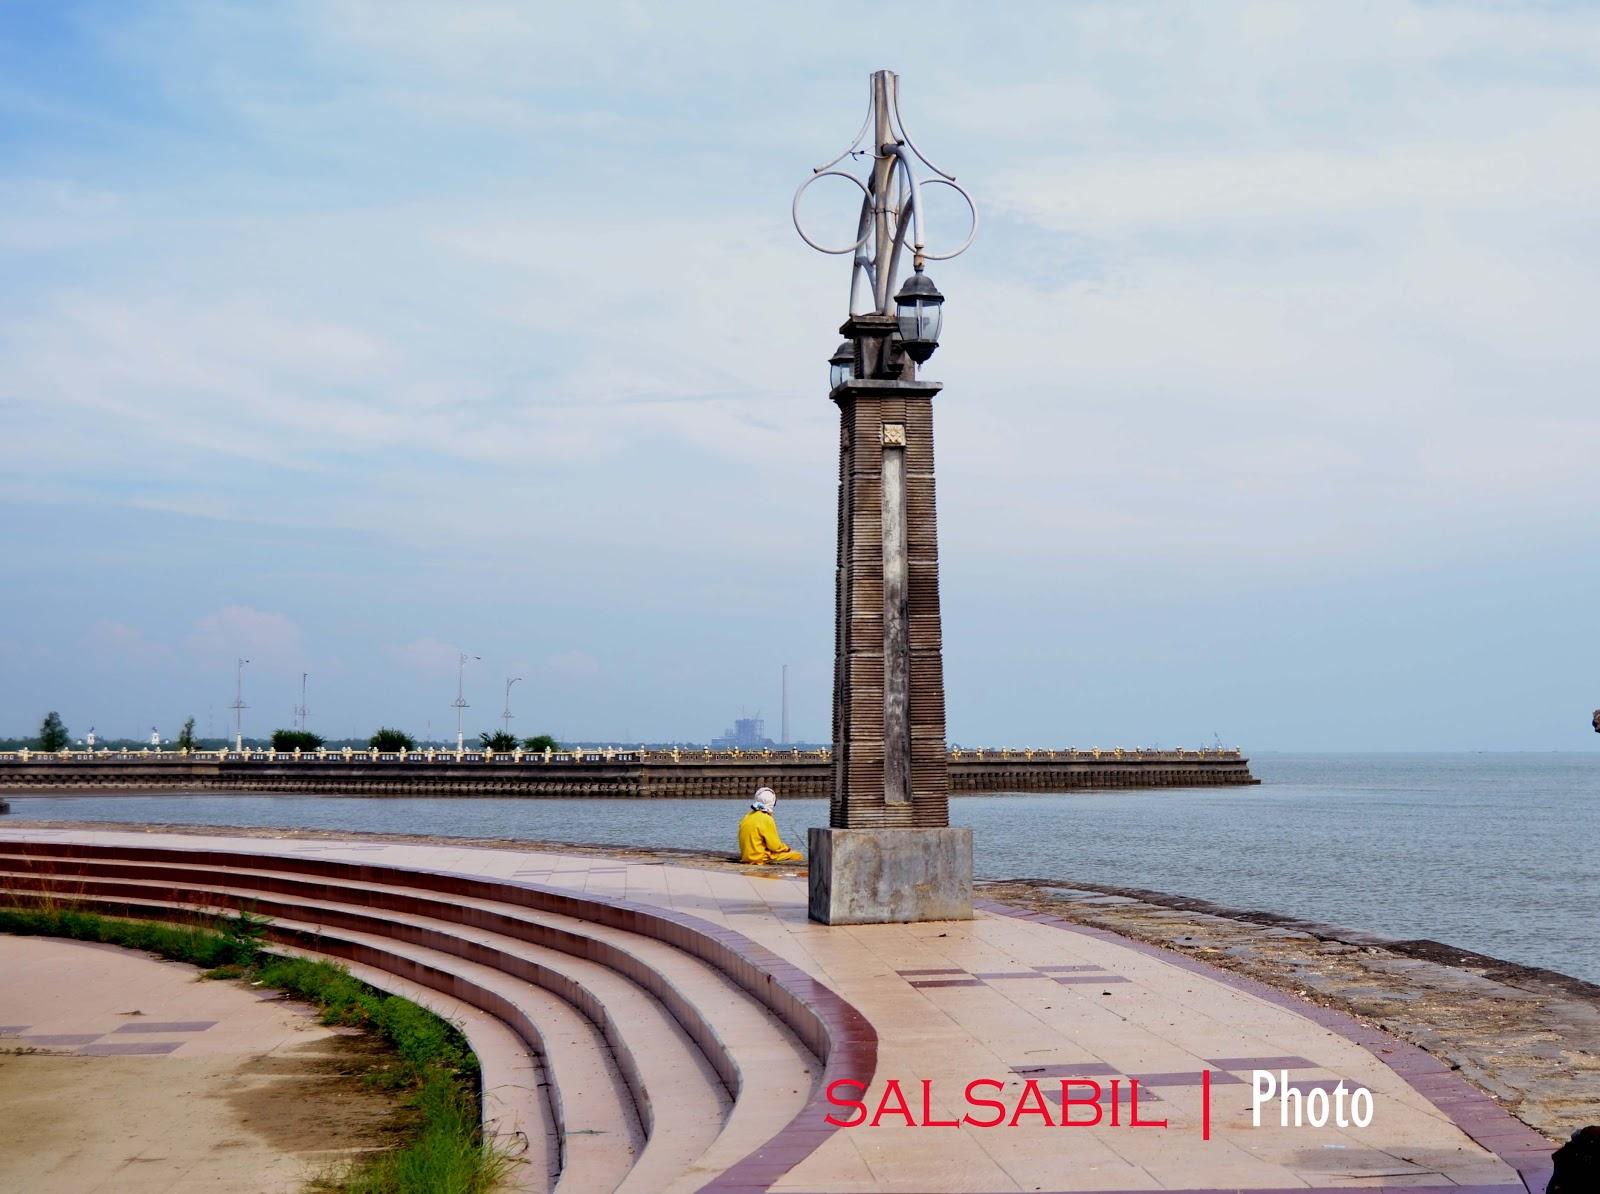 Wisata Terminal Bahari Tuban Wong Kampung Entah Lokasi Satu Termasuk